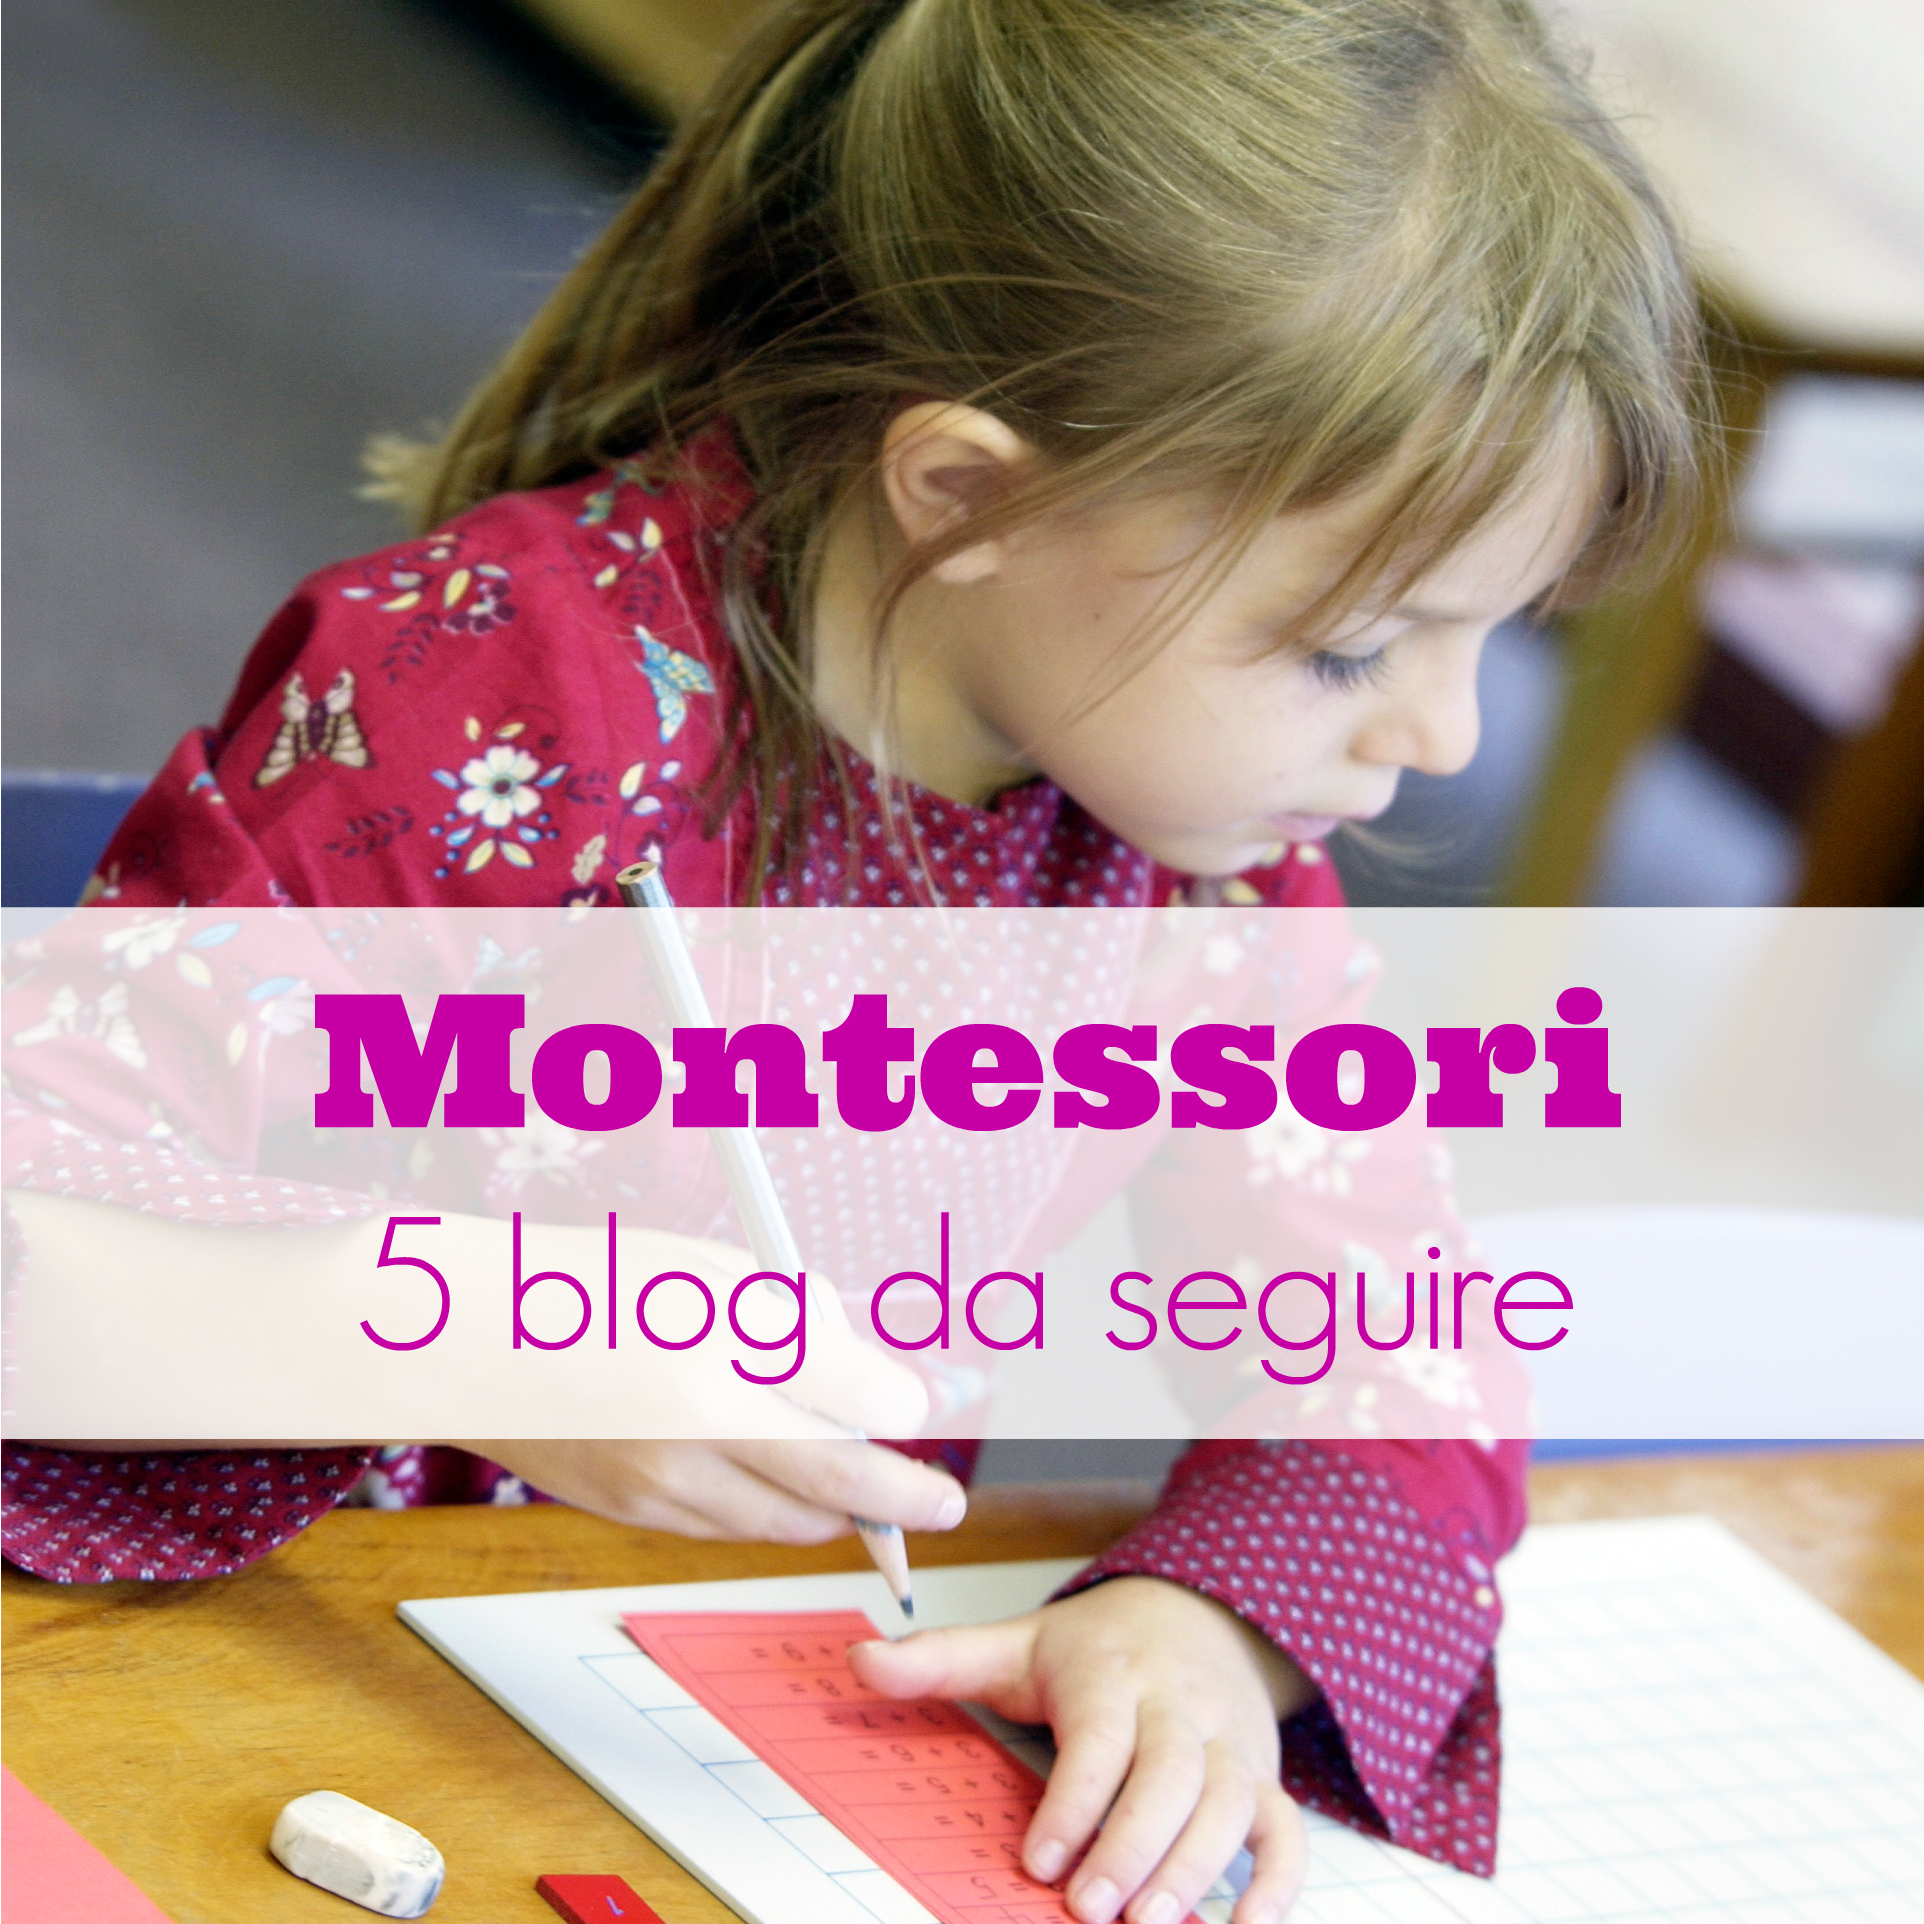 Montessori: 5 blog da seguire - BabyGreen